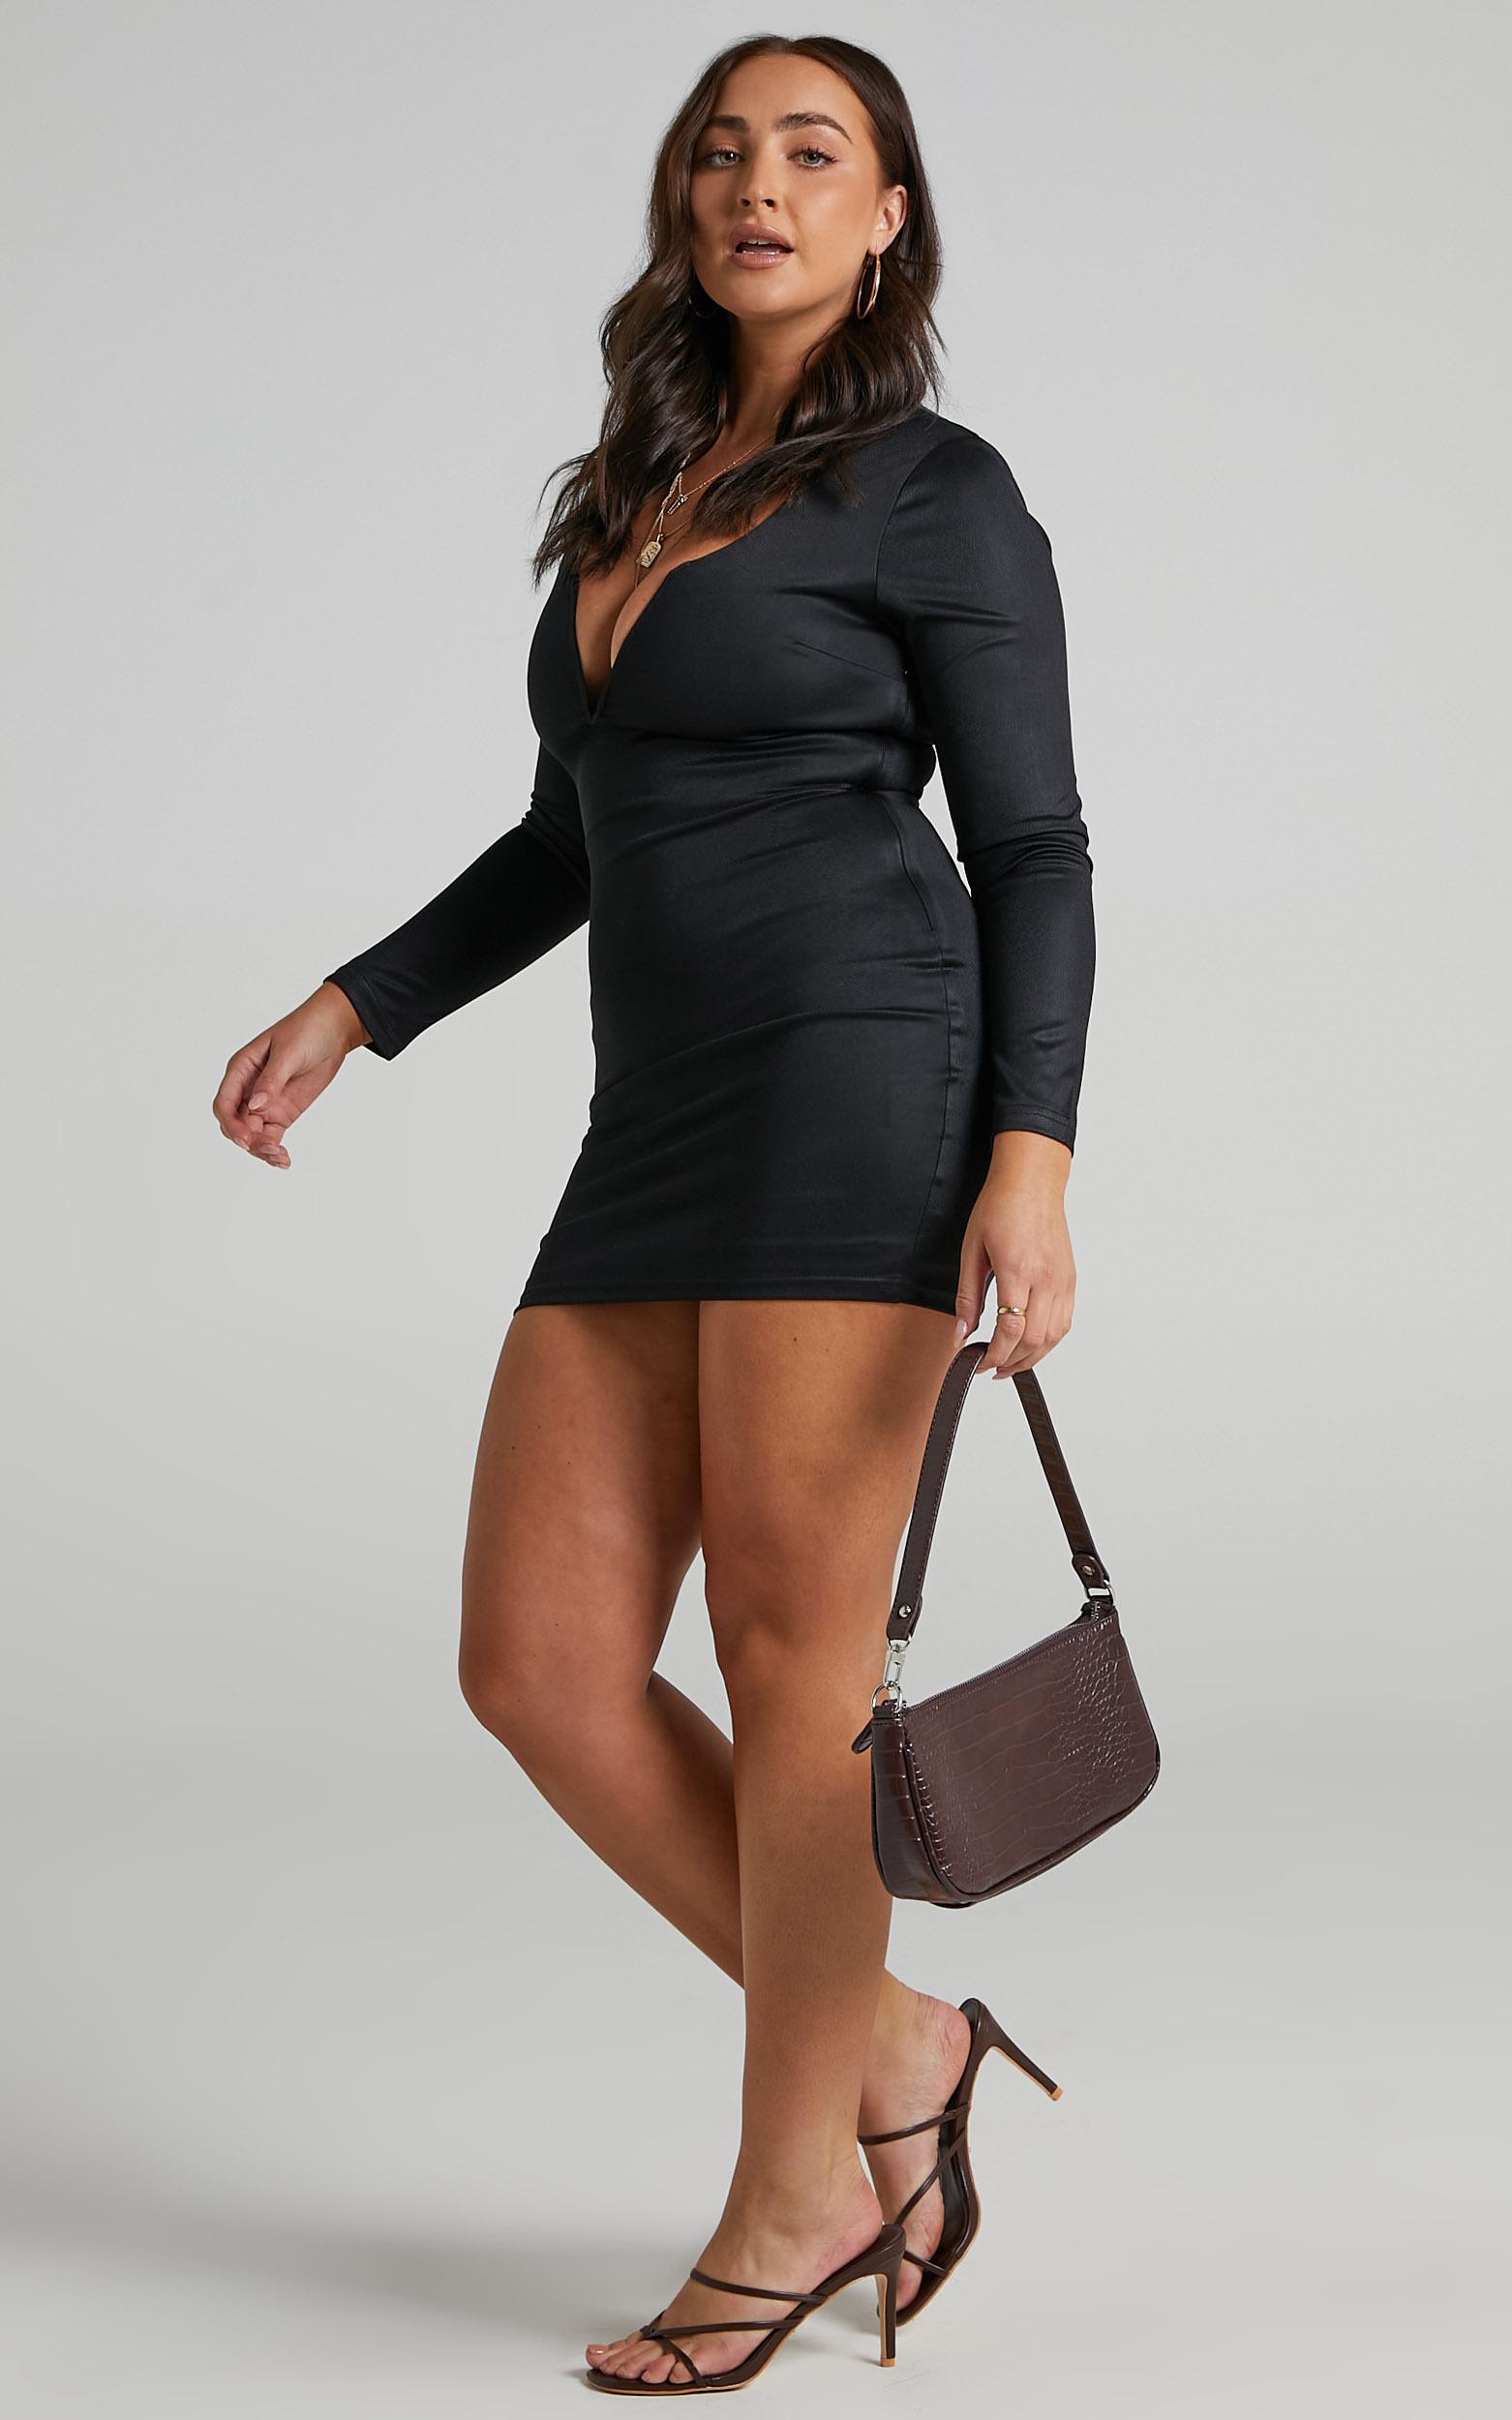 Courteney Mini Bodycon V Neck Dress in Black - 06, BLK1, hi-res image number null